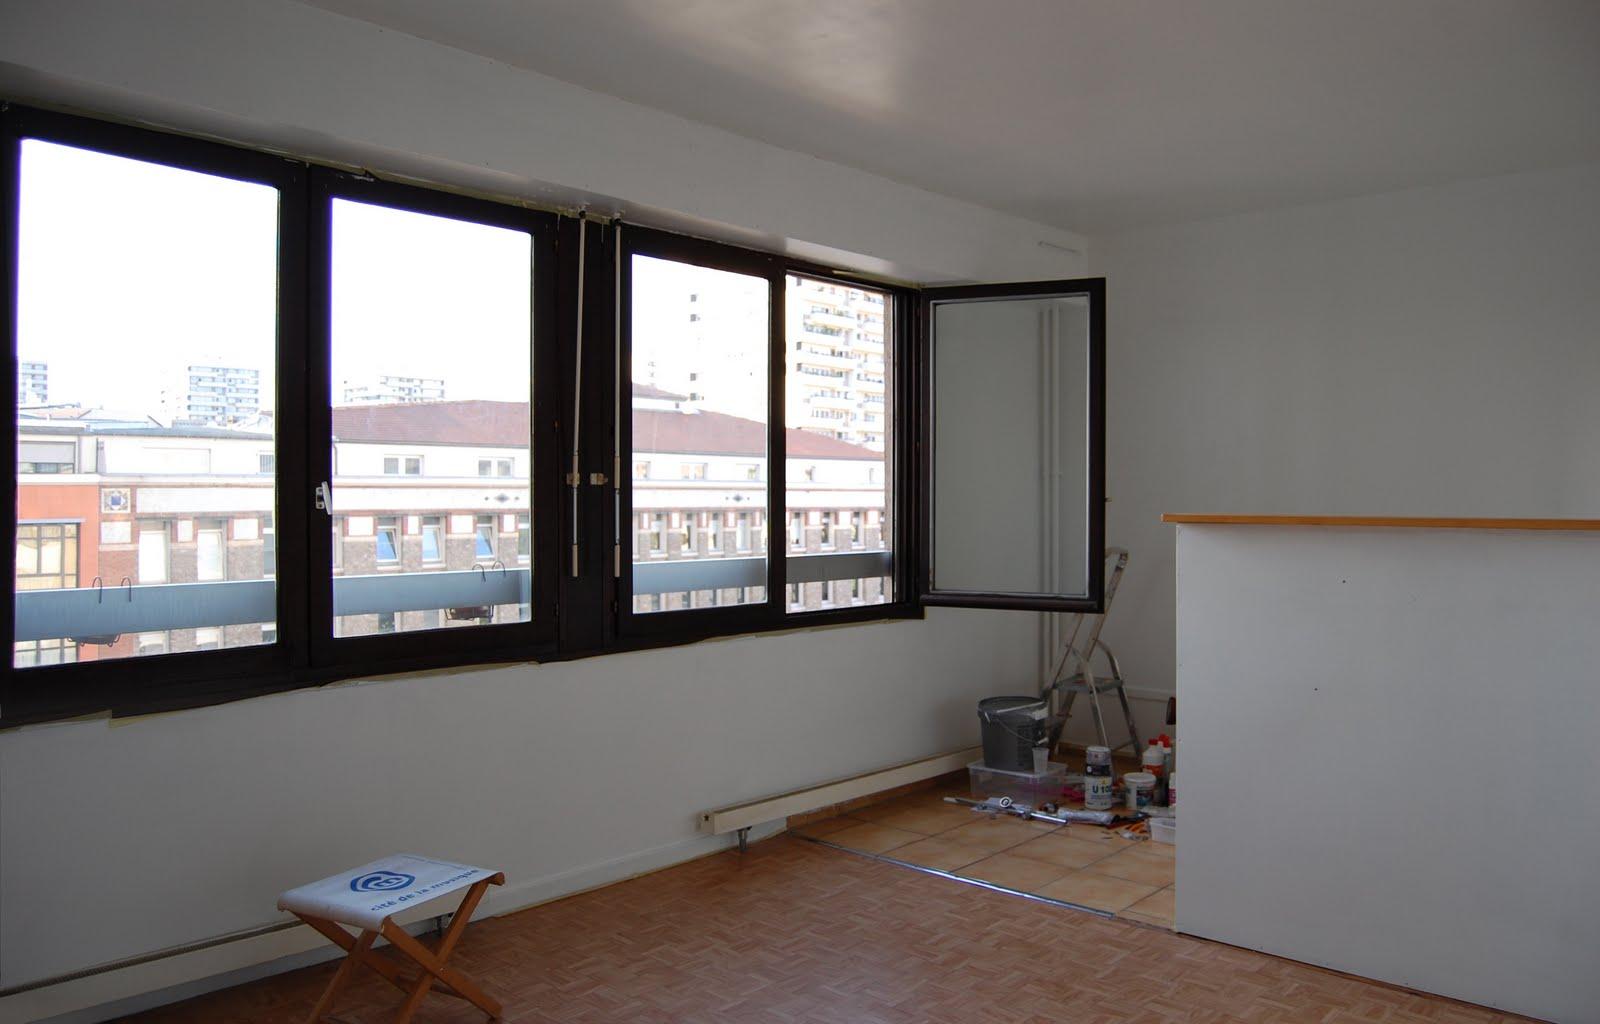 studioparis19. Black Bedroom Furniture Sets. Home Design Ideas